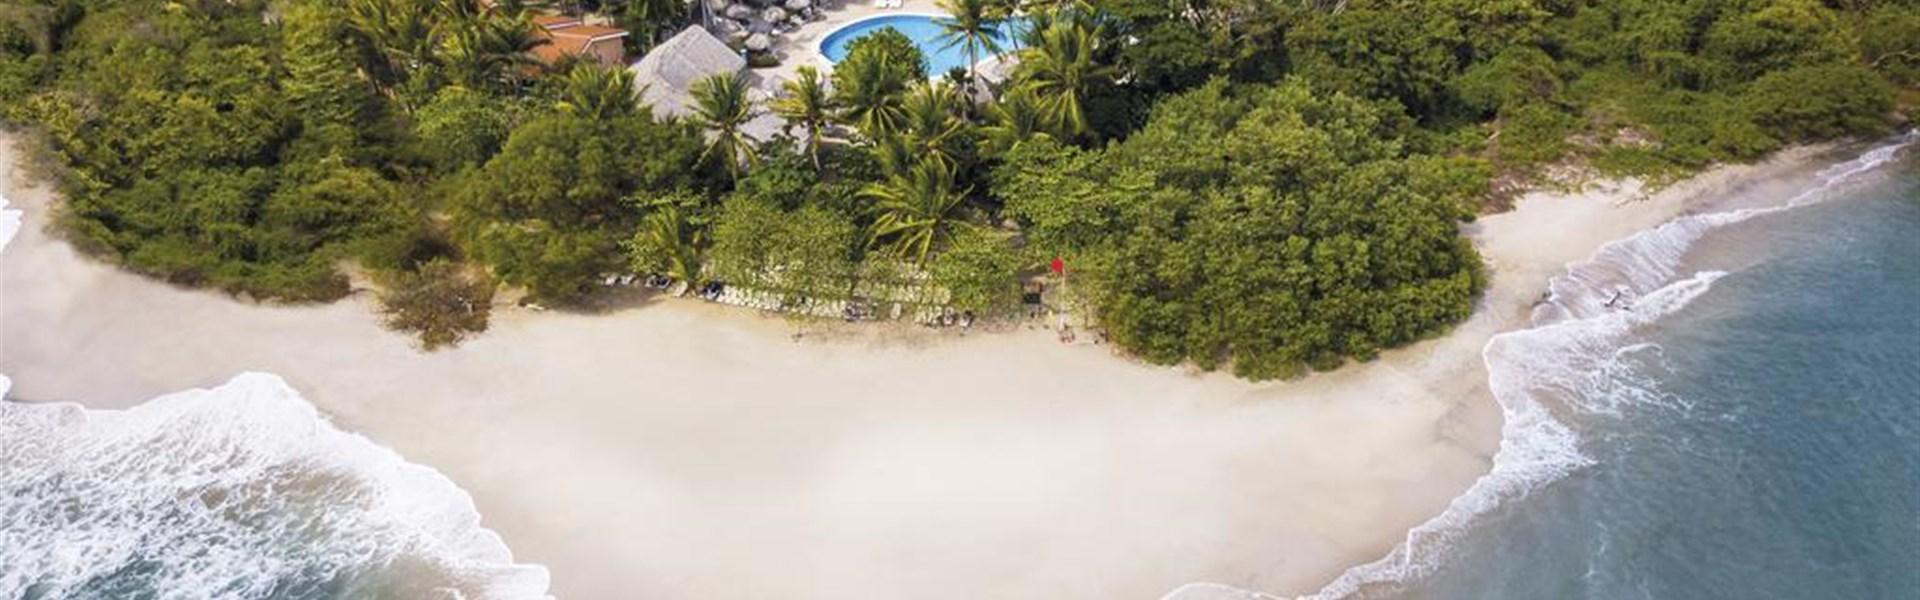 Mini Kostarika All Inclusive -